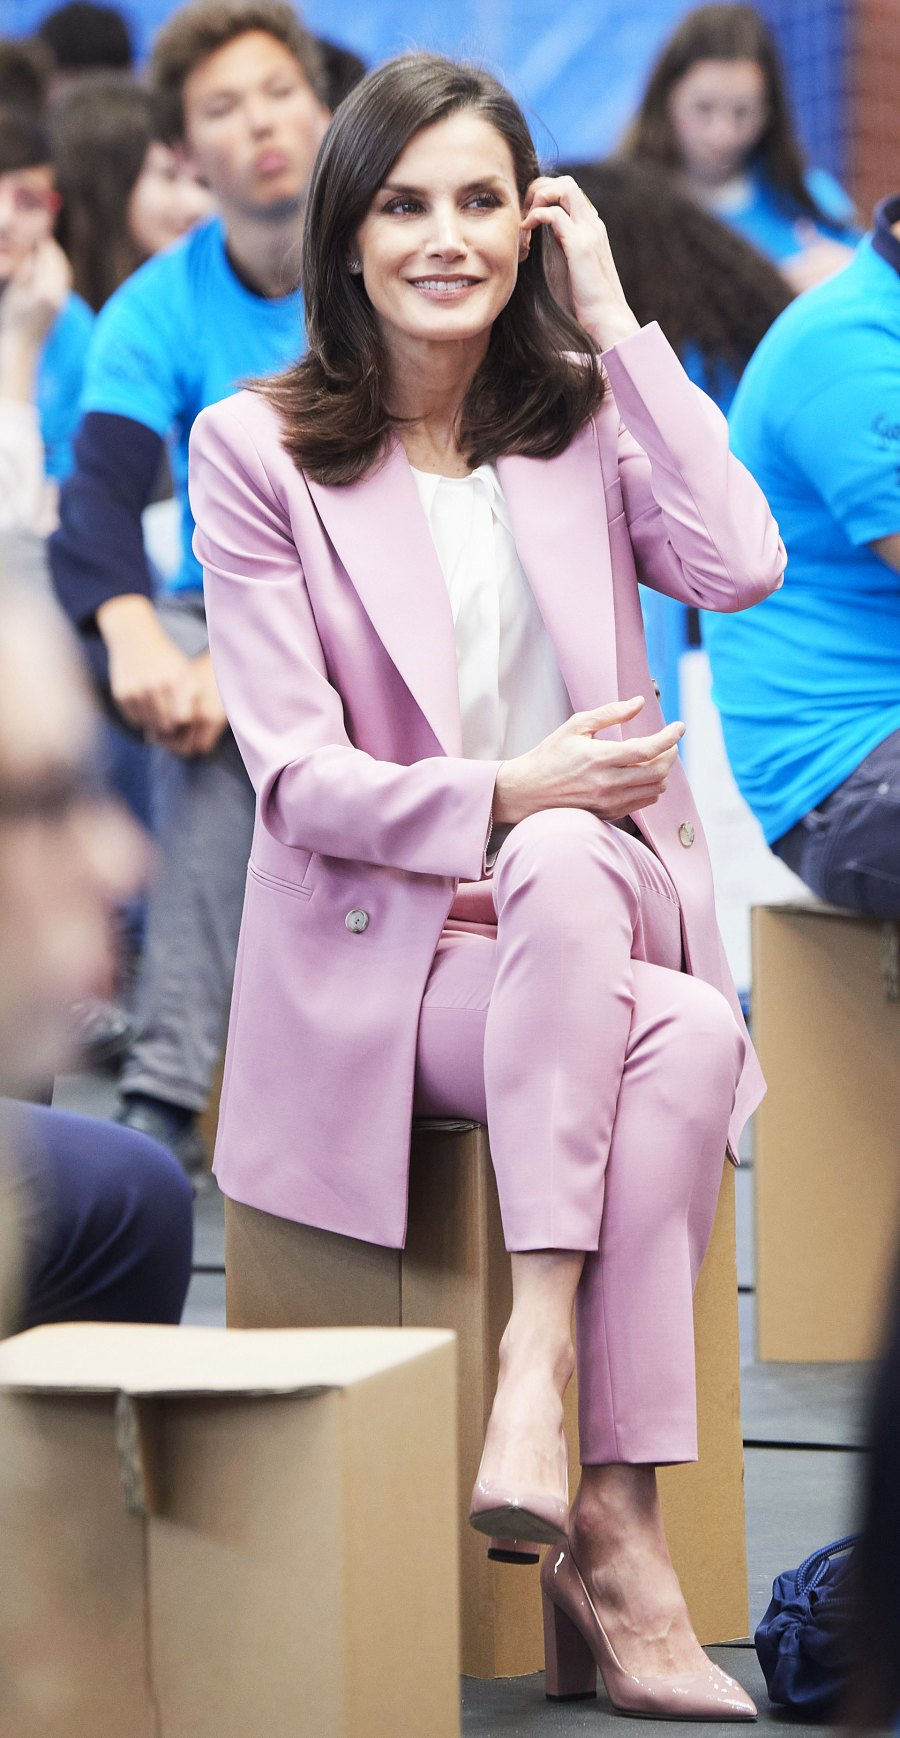 Queen Letizia Chic Pantsuit February 12, 2020